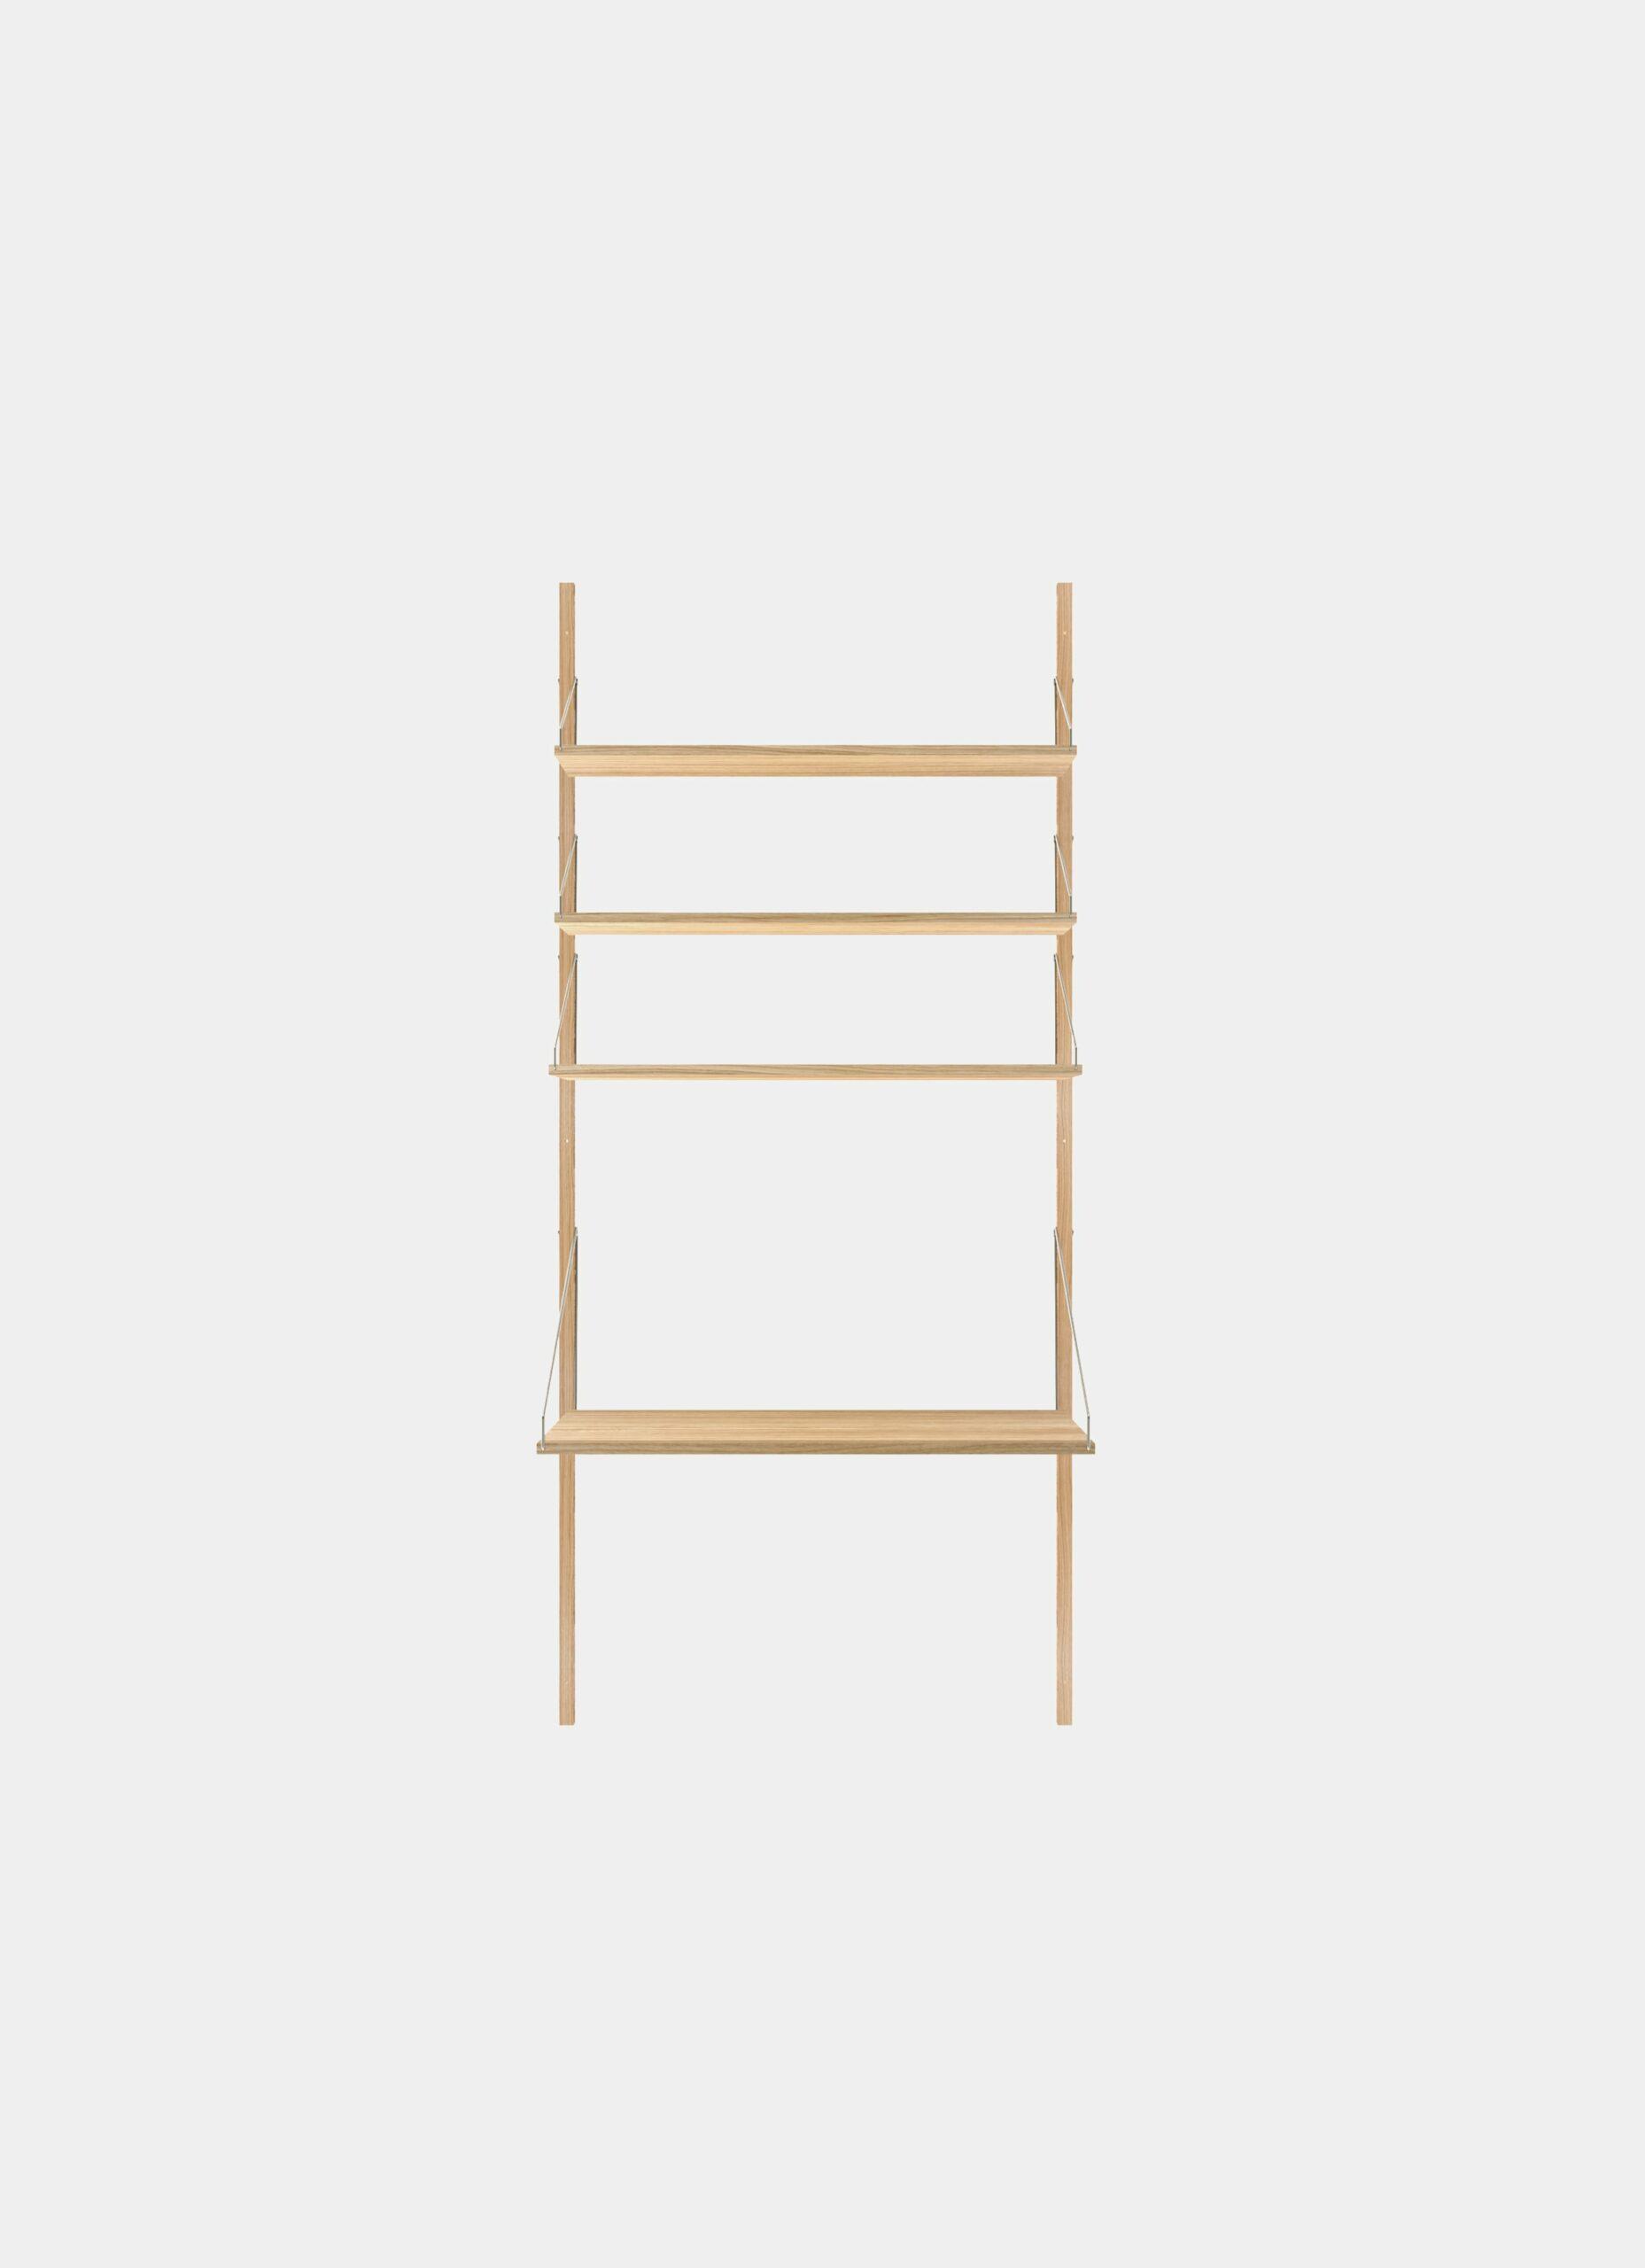 Frama - Shelf Library - Natural - H1852 - Desk Section